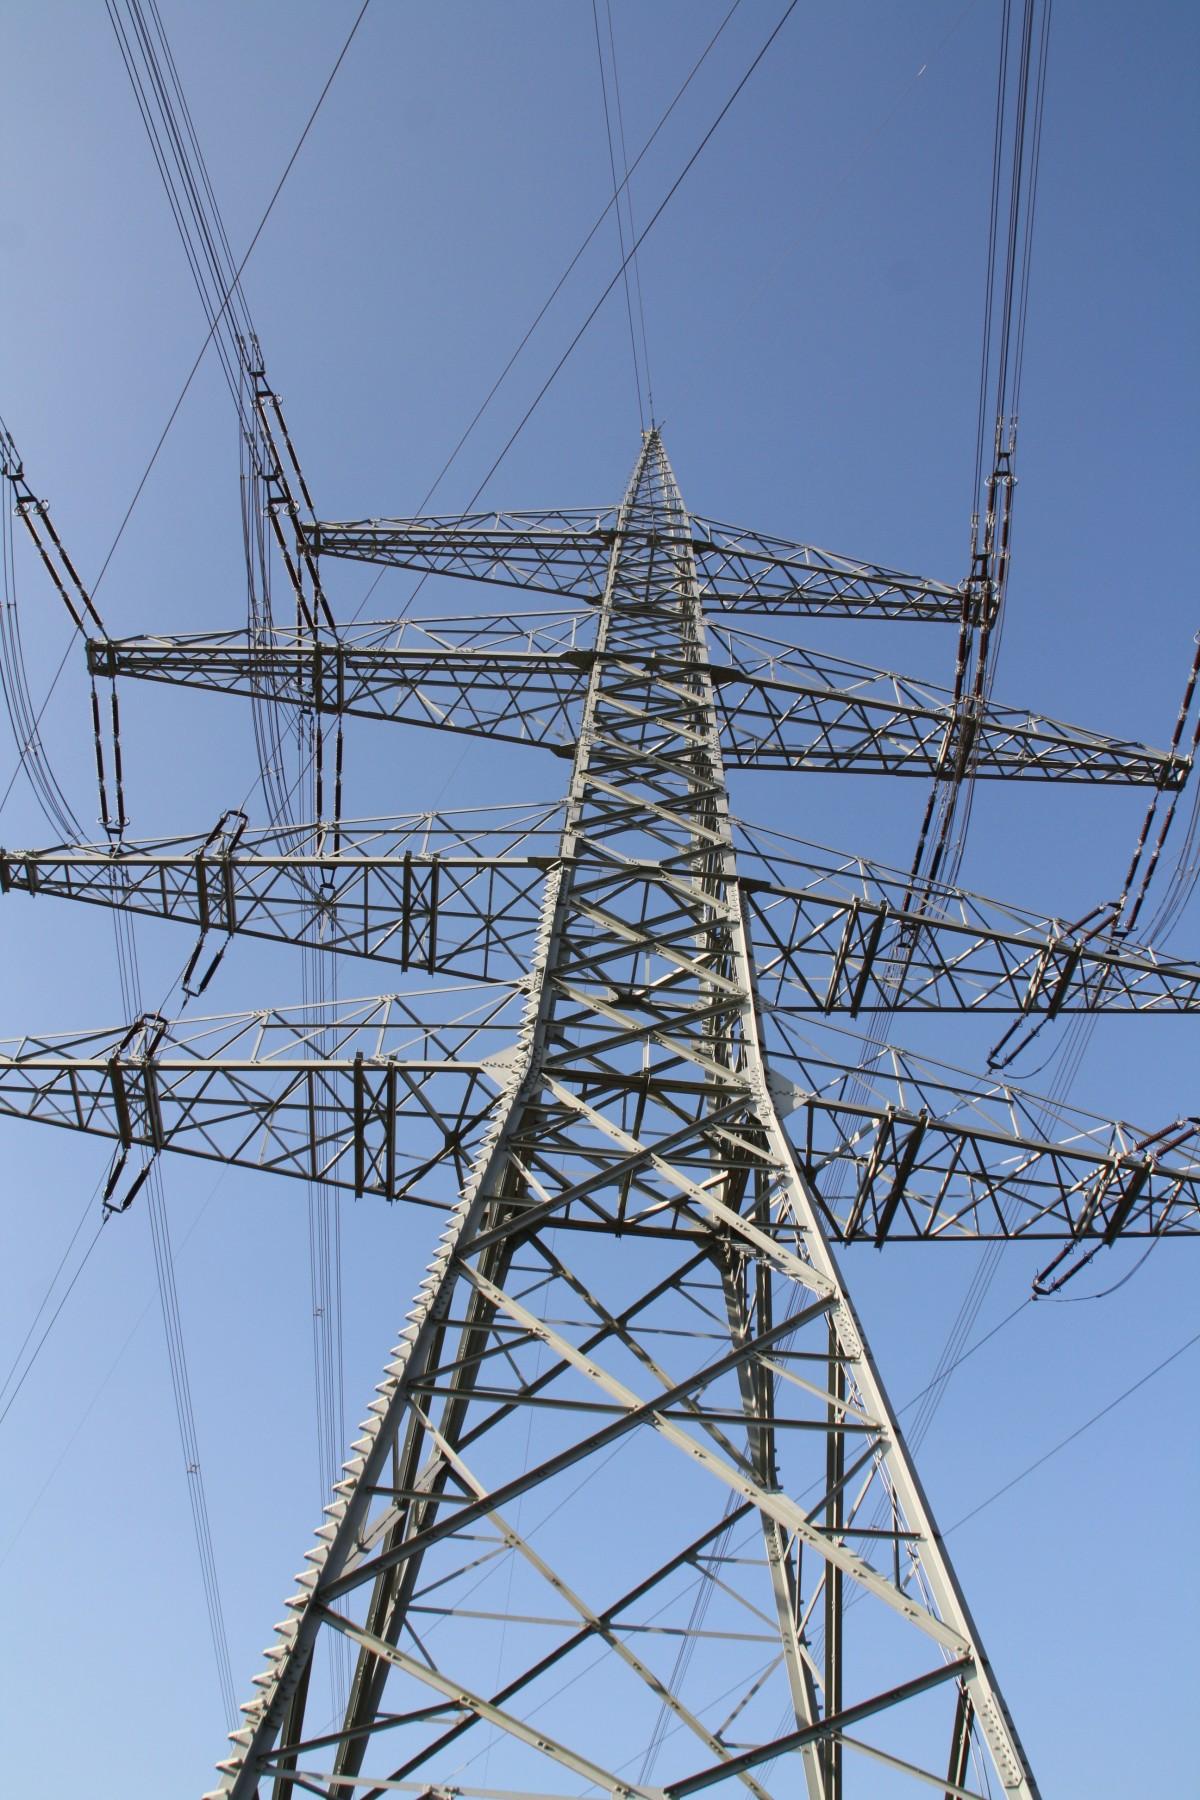 Fotos gratis : cable, línea, torre, Línea eléctrica, mástil, energía ...